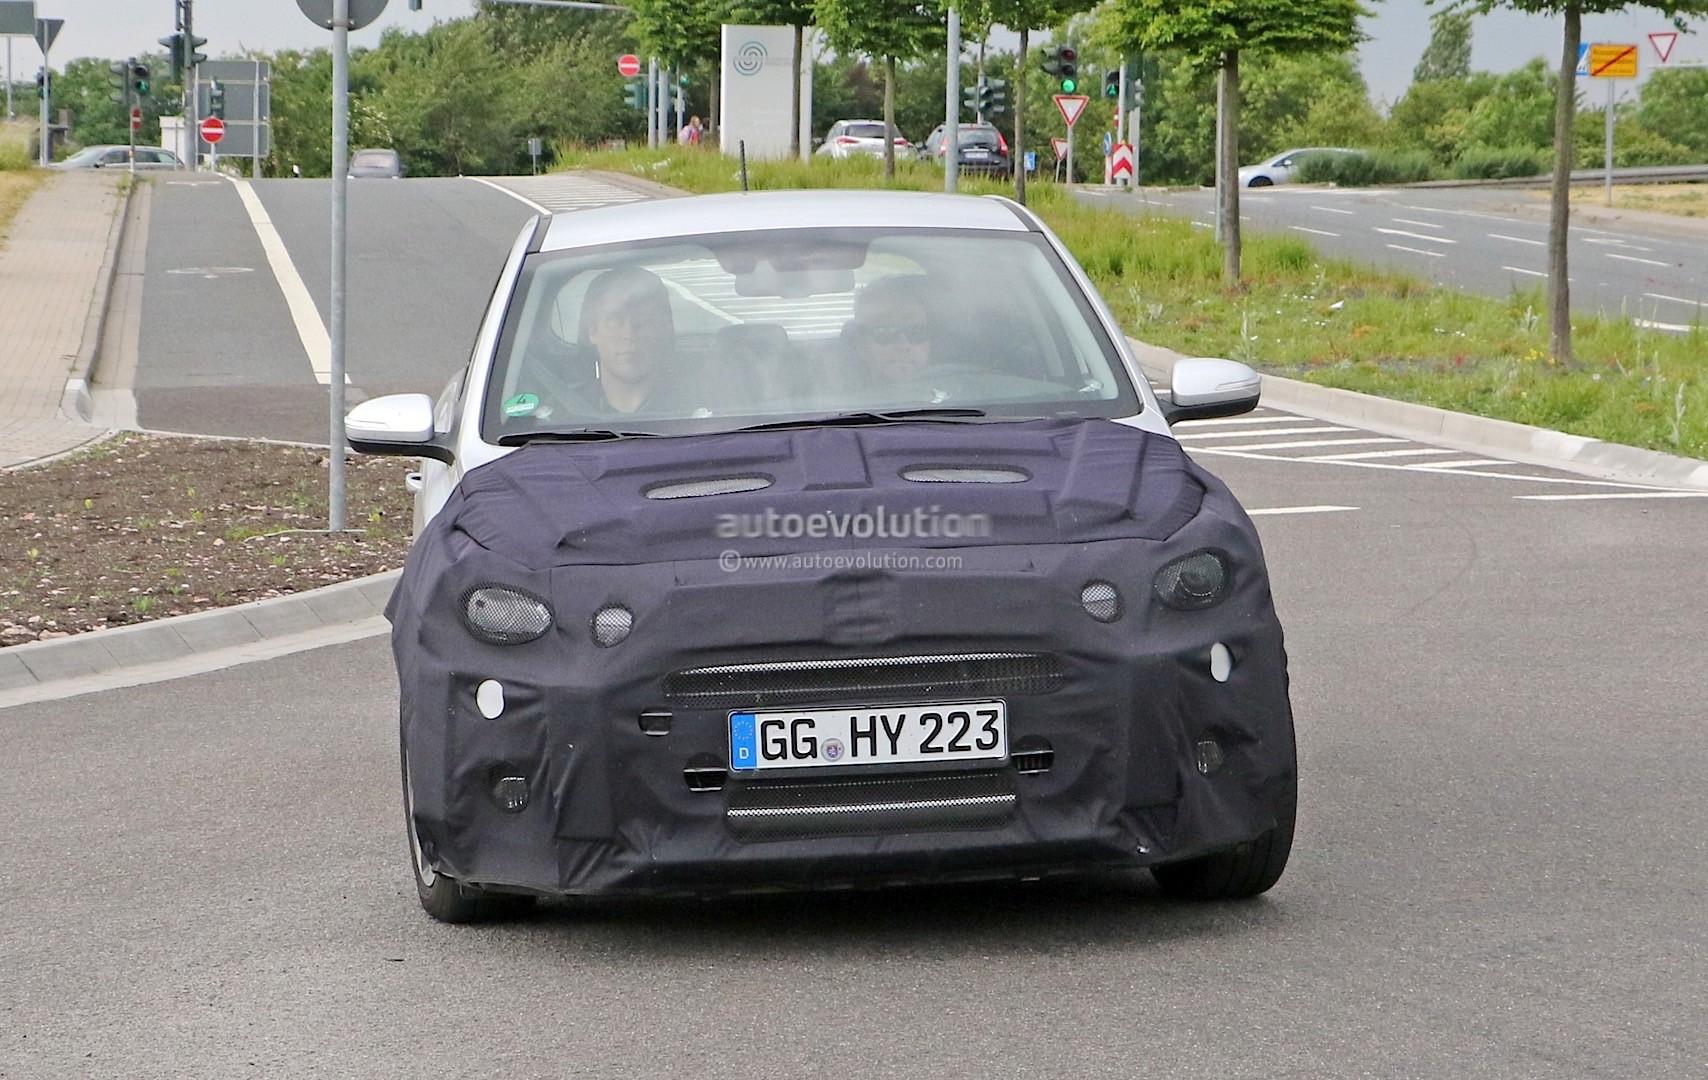 2018 - [Hyundai] I20 restylée Spyshots-hyundai-i20-prototype-spied-we-think-it-s-a-facelifted-version_2